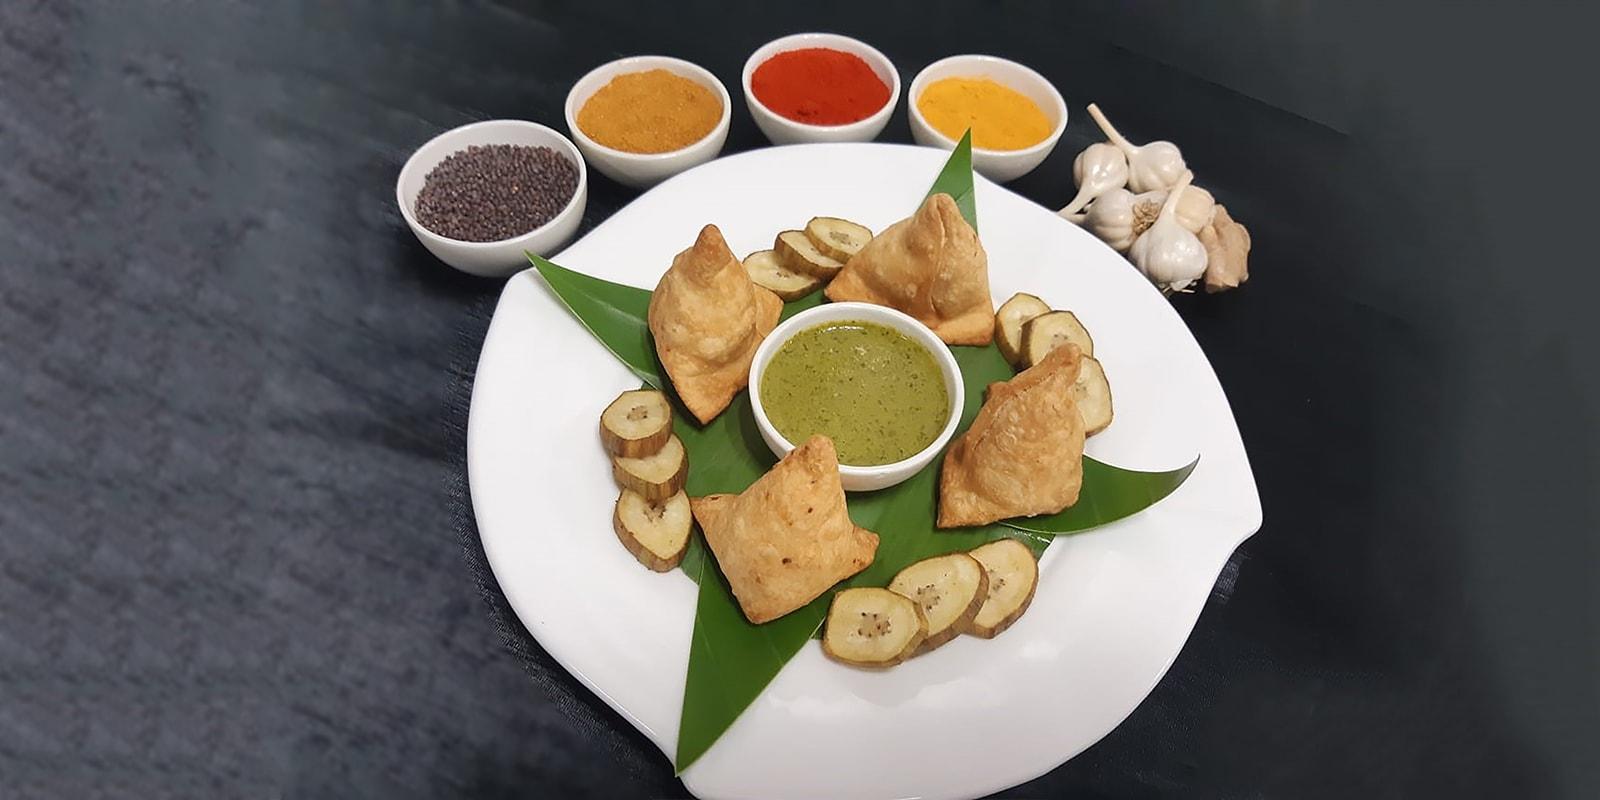 Healthy Oven Baked Raw Banana Samosa_Chef Narayan Salunke, Radisson Blu Resort & Alibaug